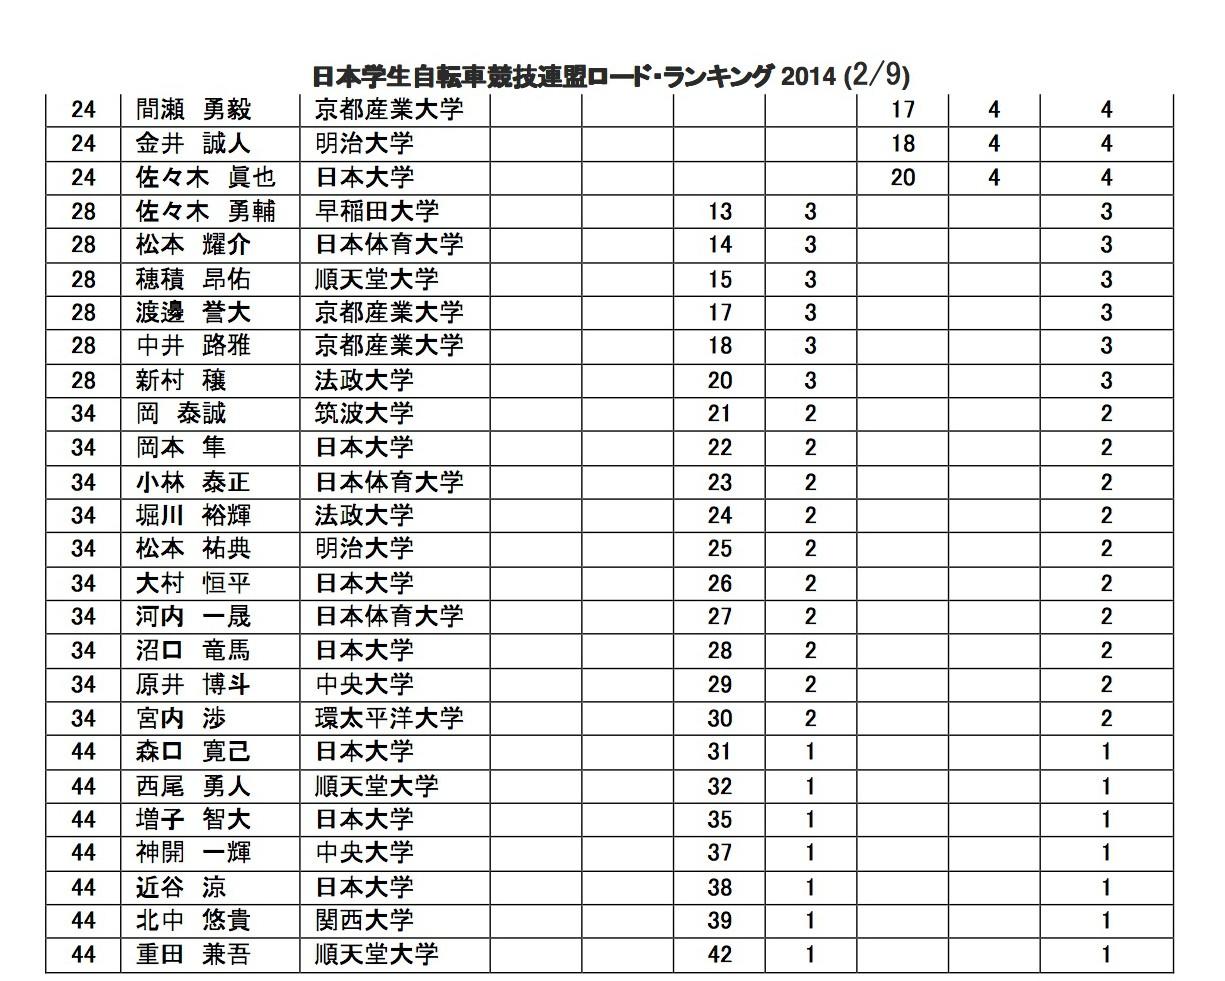 rr_rank_2014_02